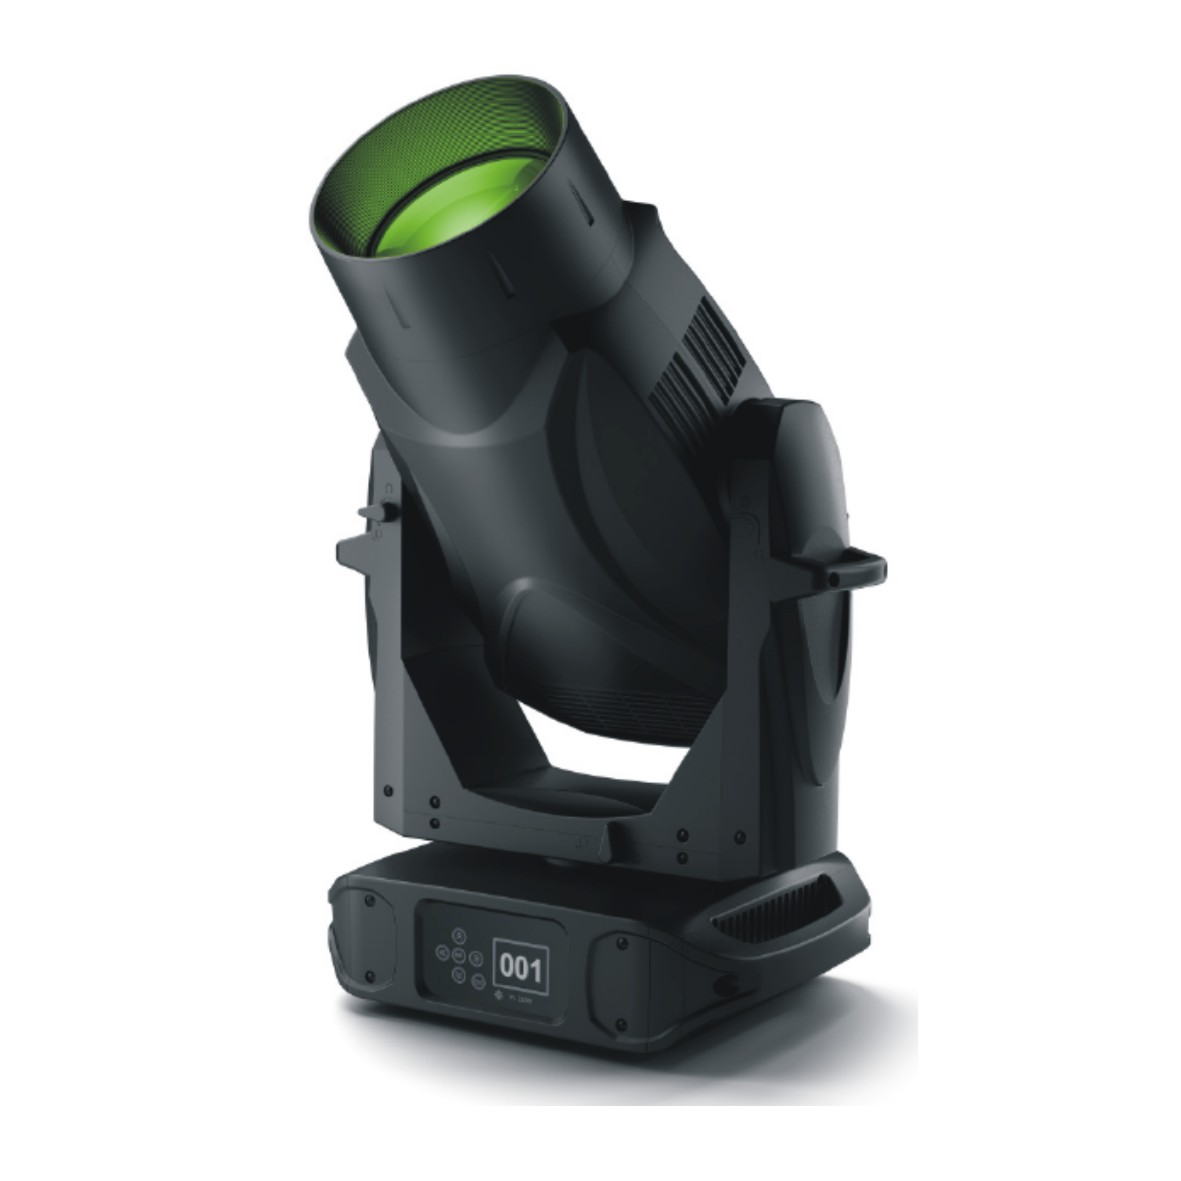 VariLite VL2600 SPOT 电脑摇头图案灯